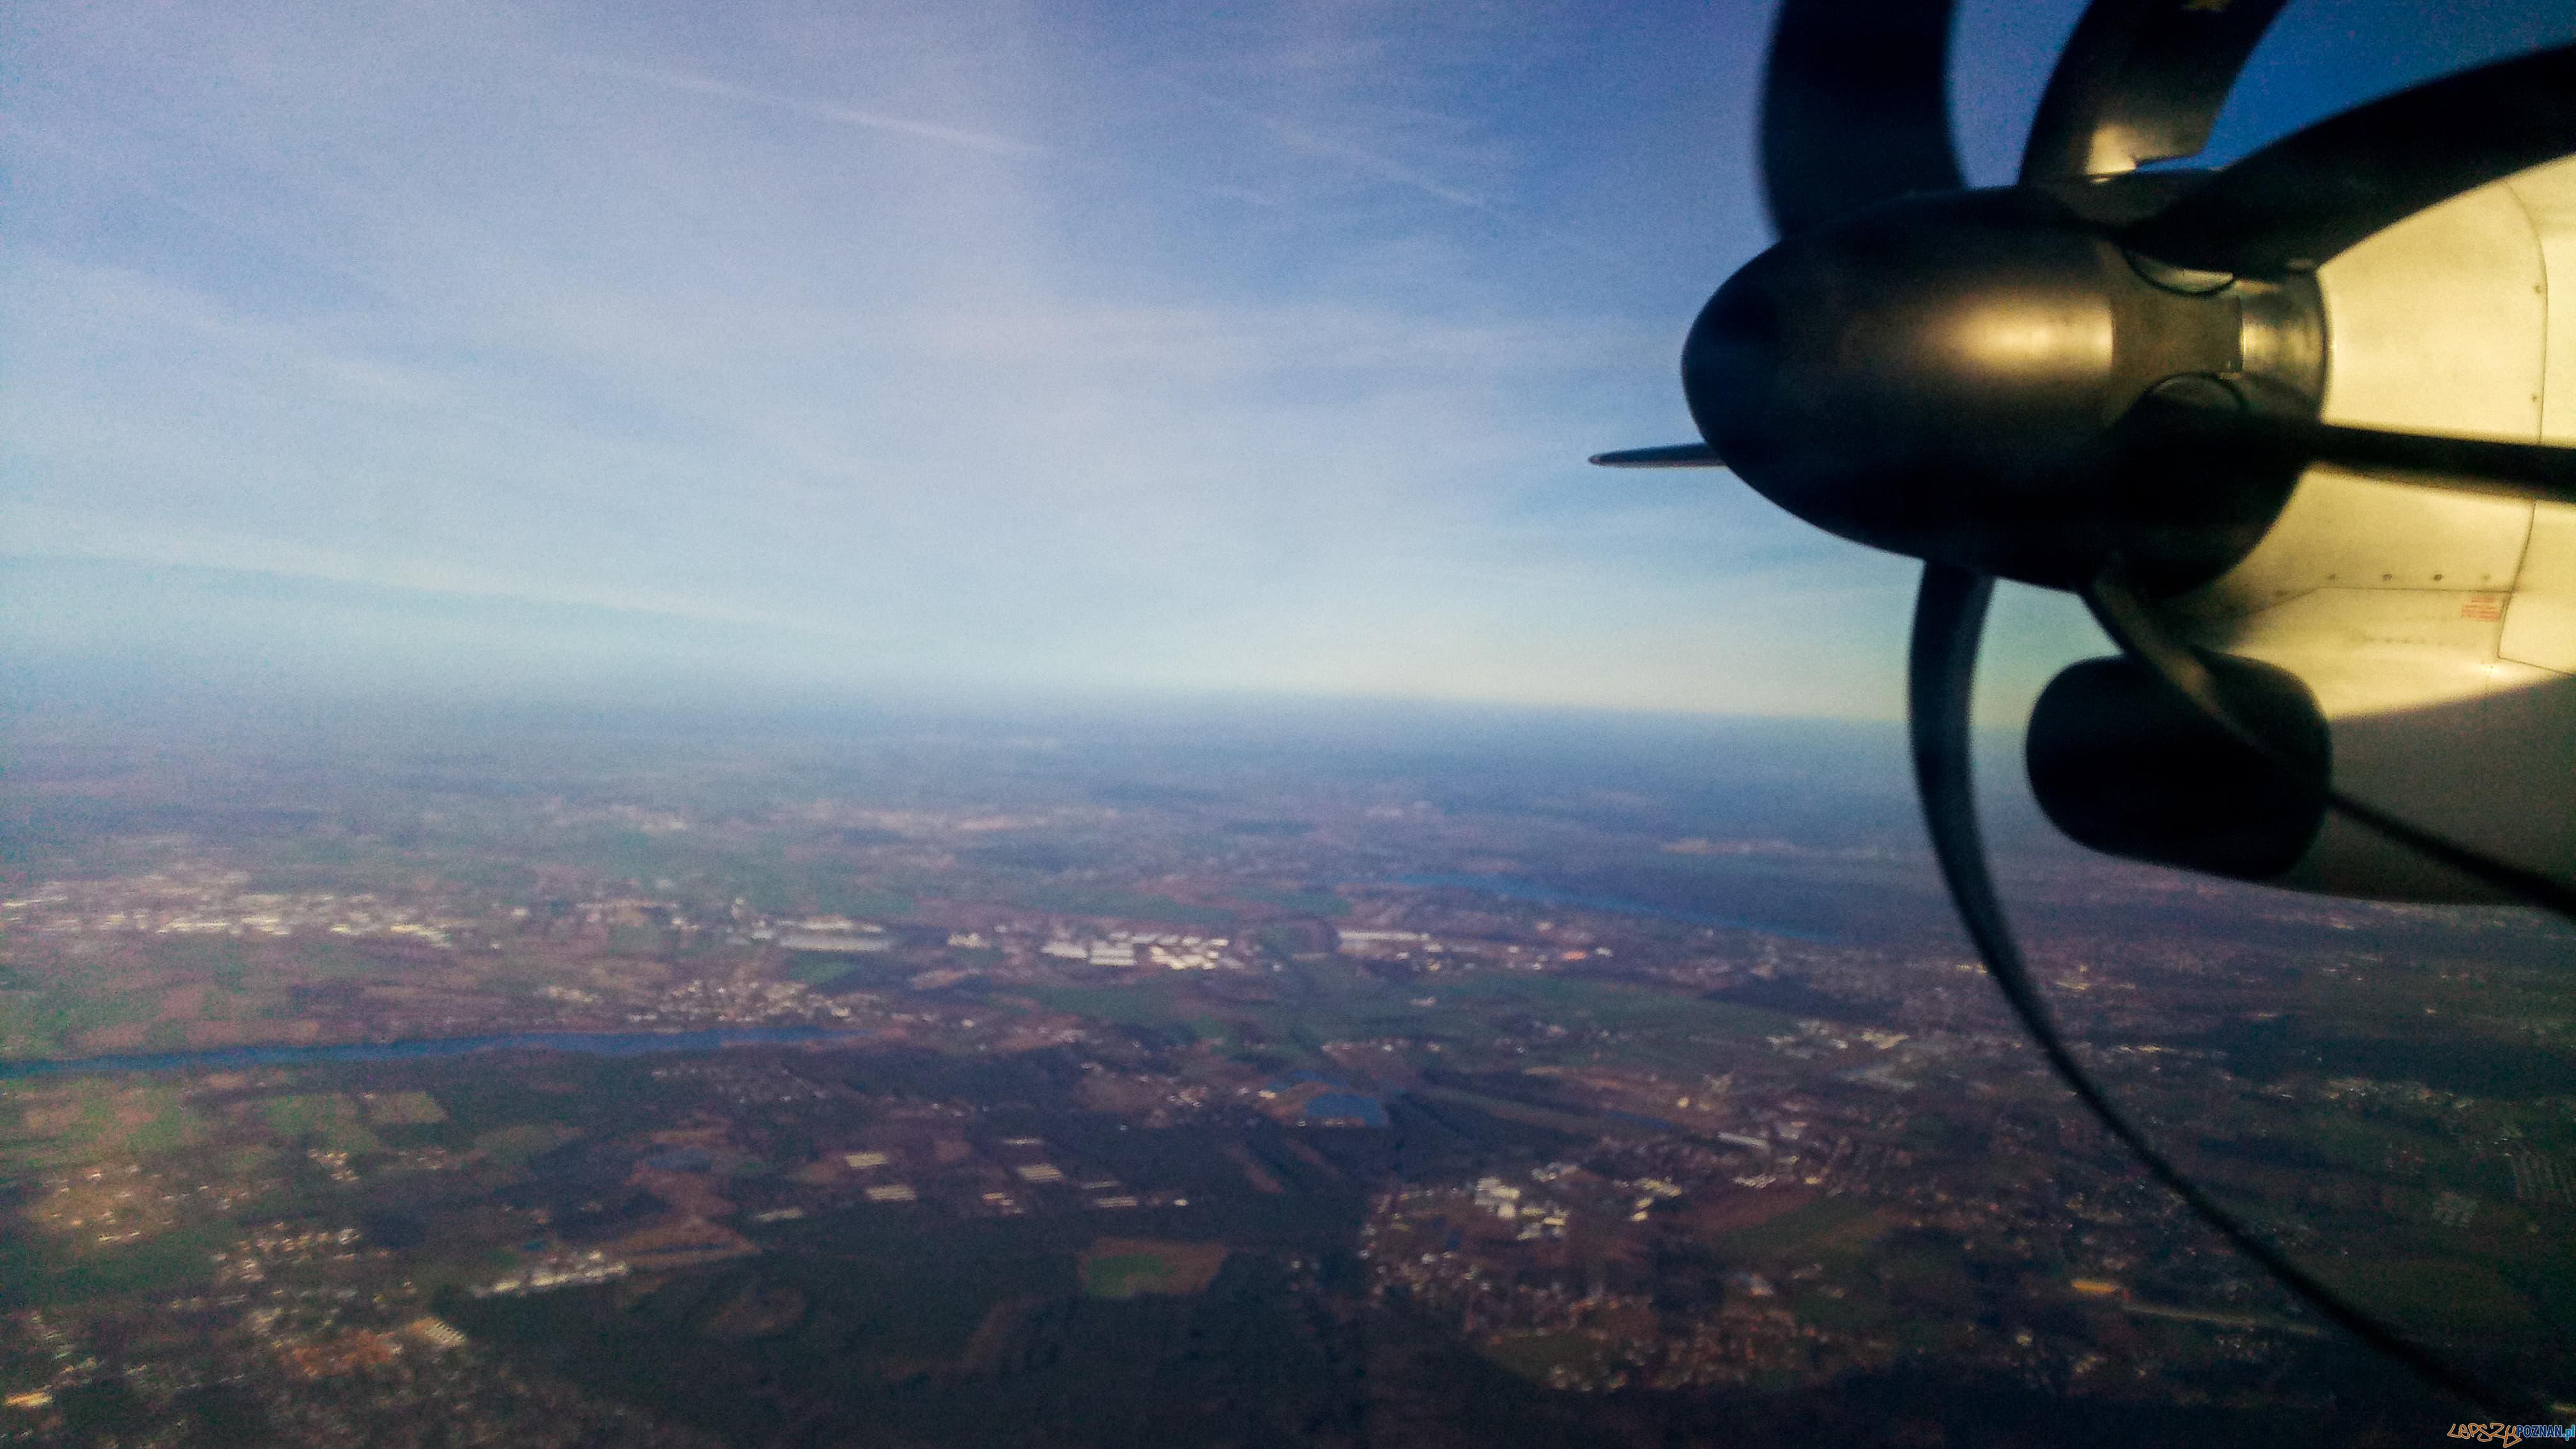 Samolot  Foto: lepszyPOZNAN.pl / gsm